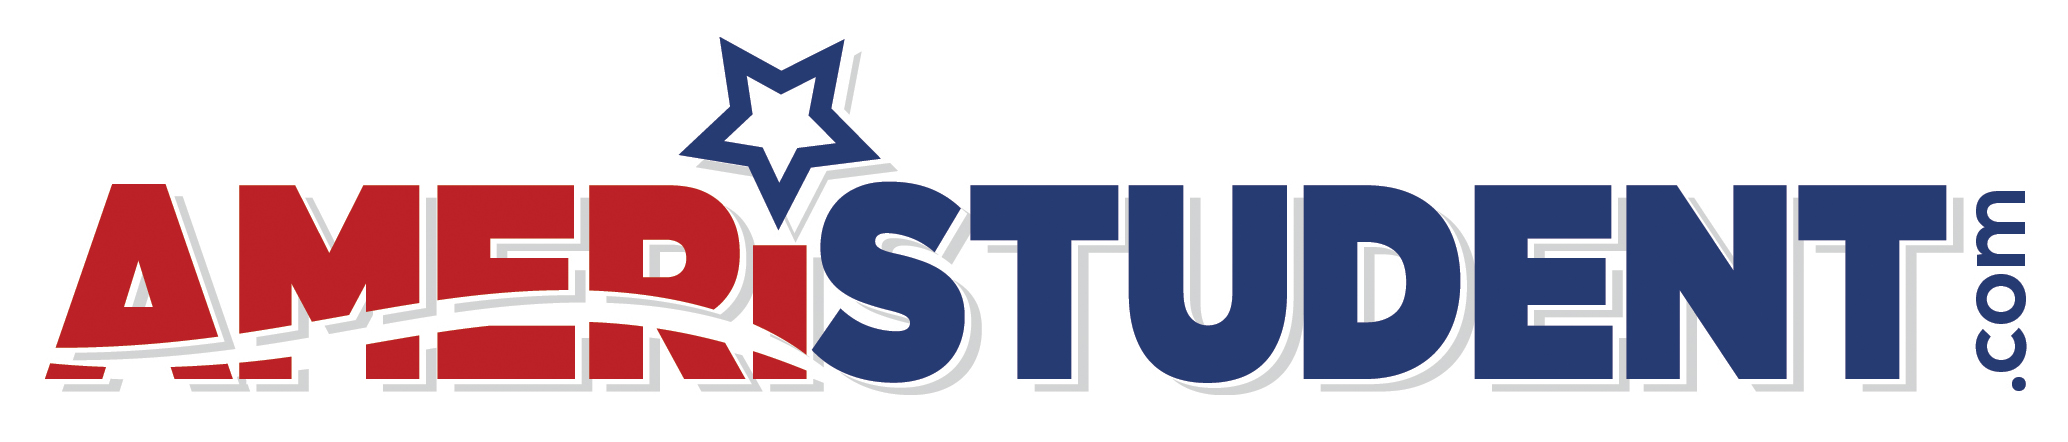 AmeriStudent Logo